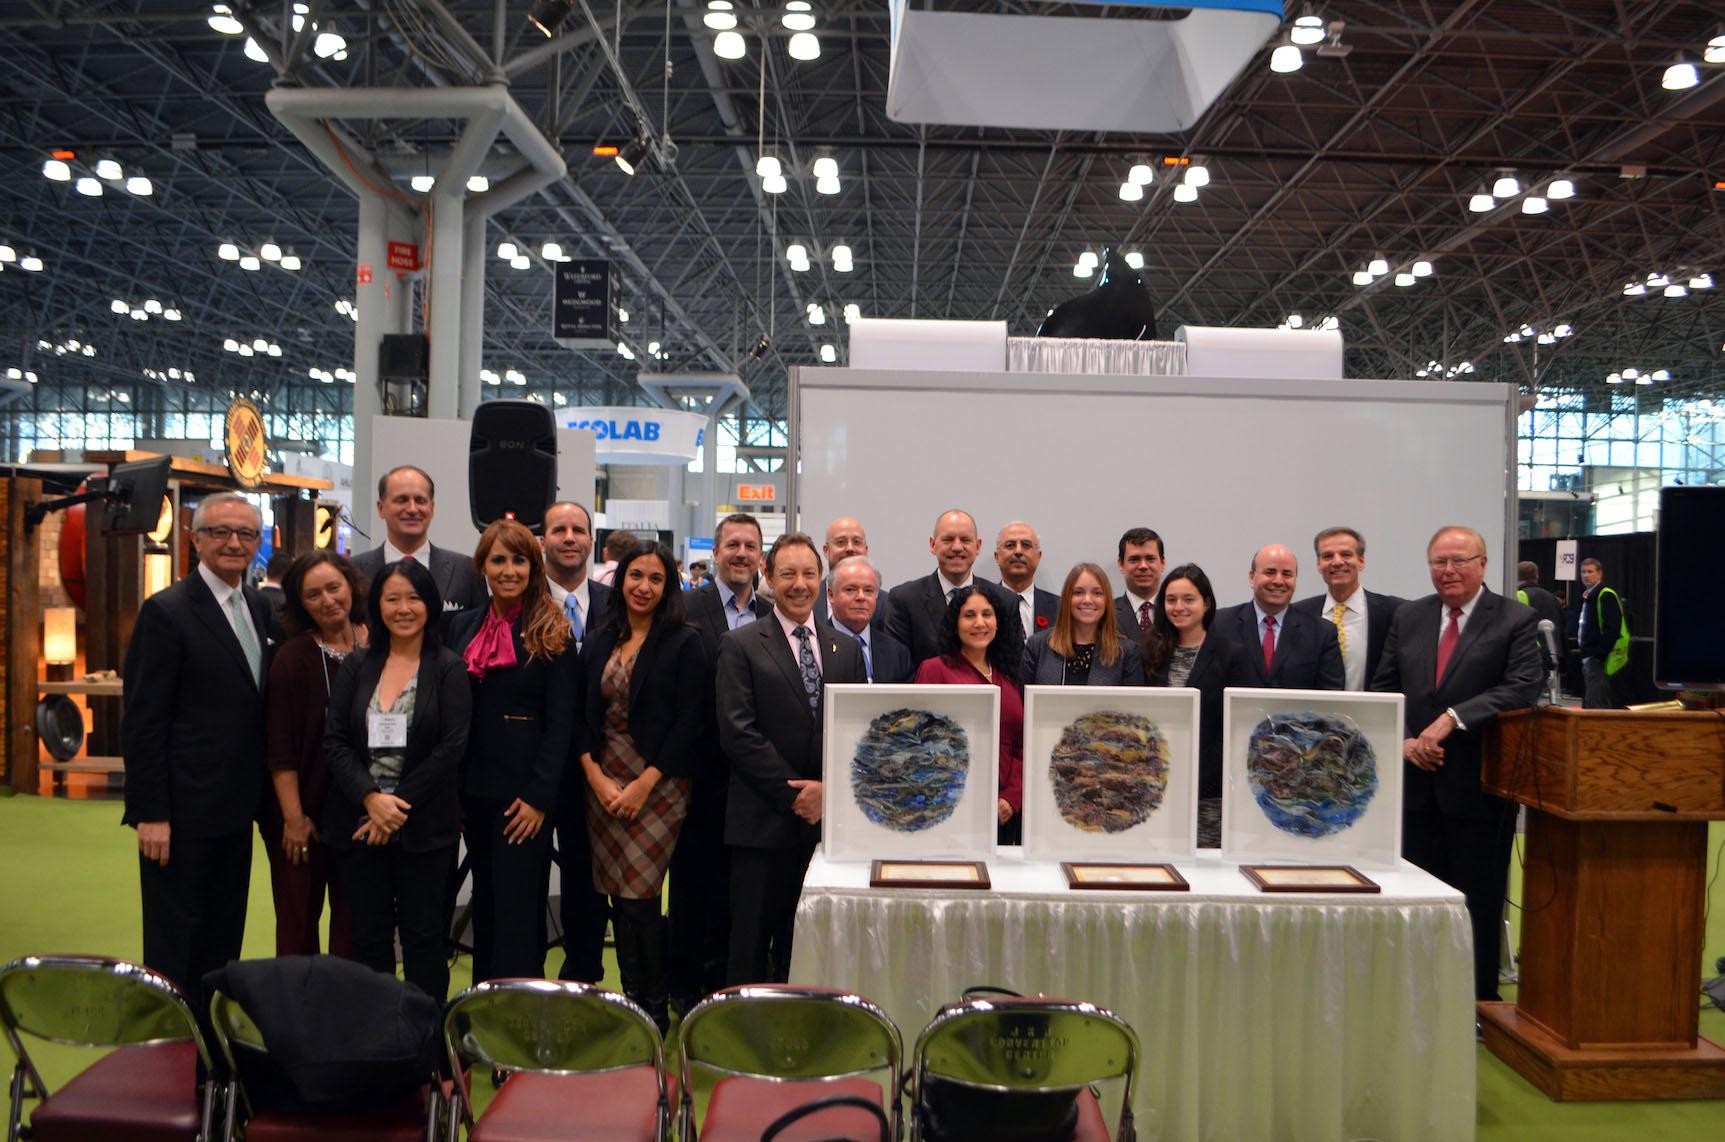 HANYC Sustainability Awards - Winners, judges and Sustainability Committee members